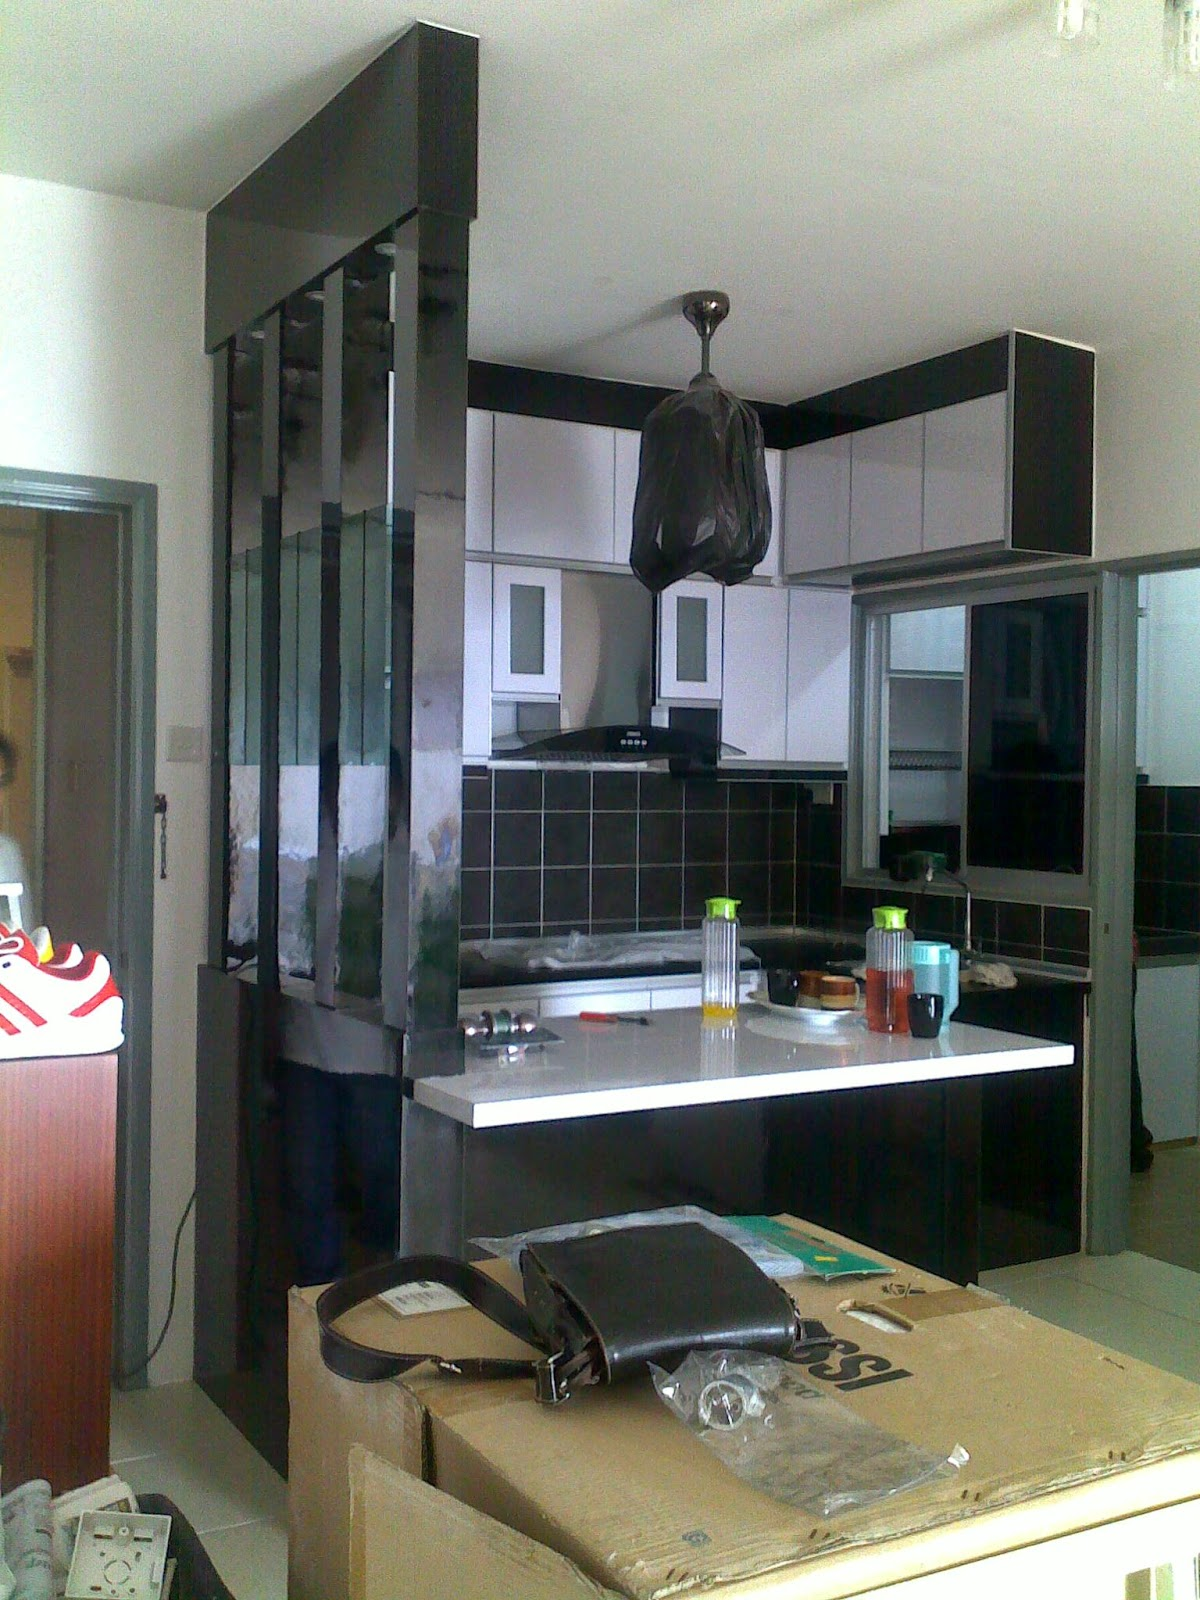 Kabinet Dapur Terus Dari Kilang Kabinet Dapur High Gloss Danau Kota